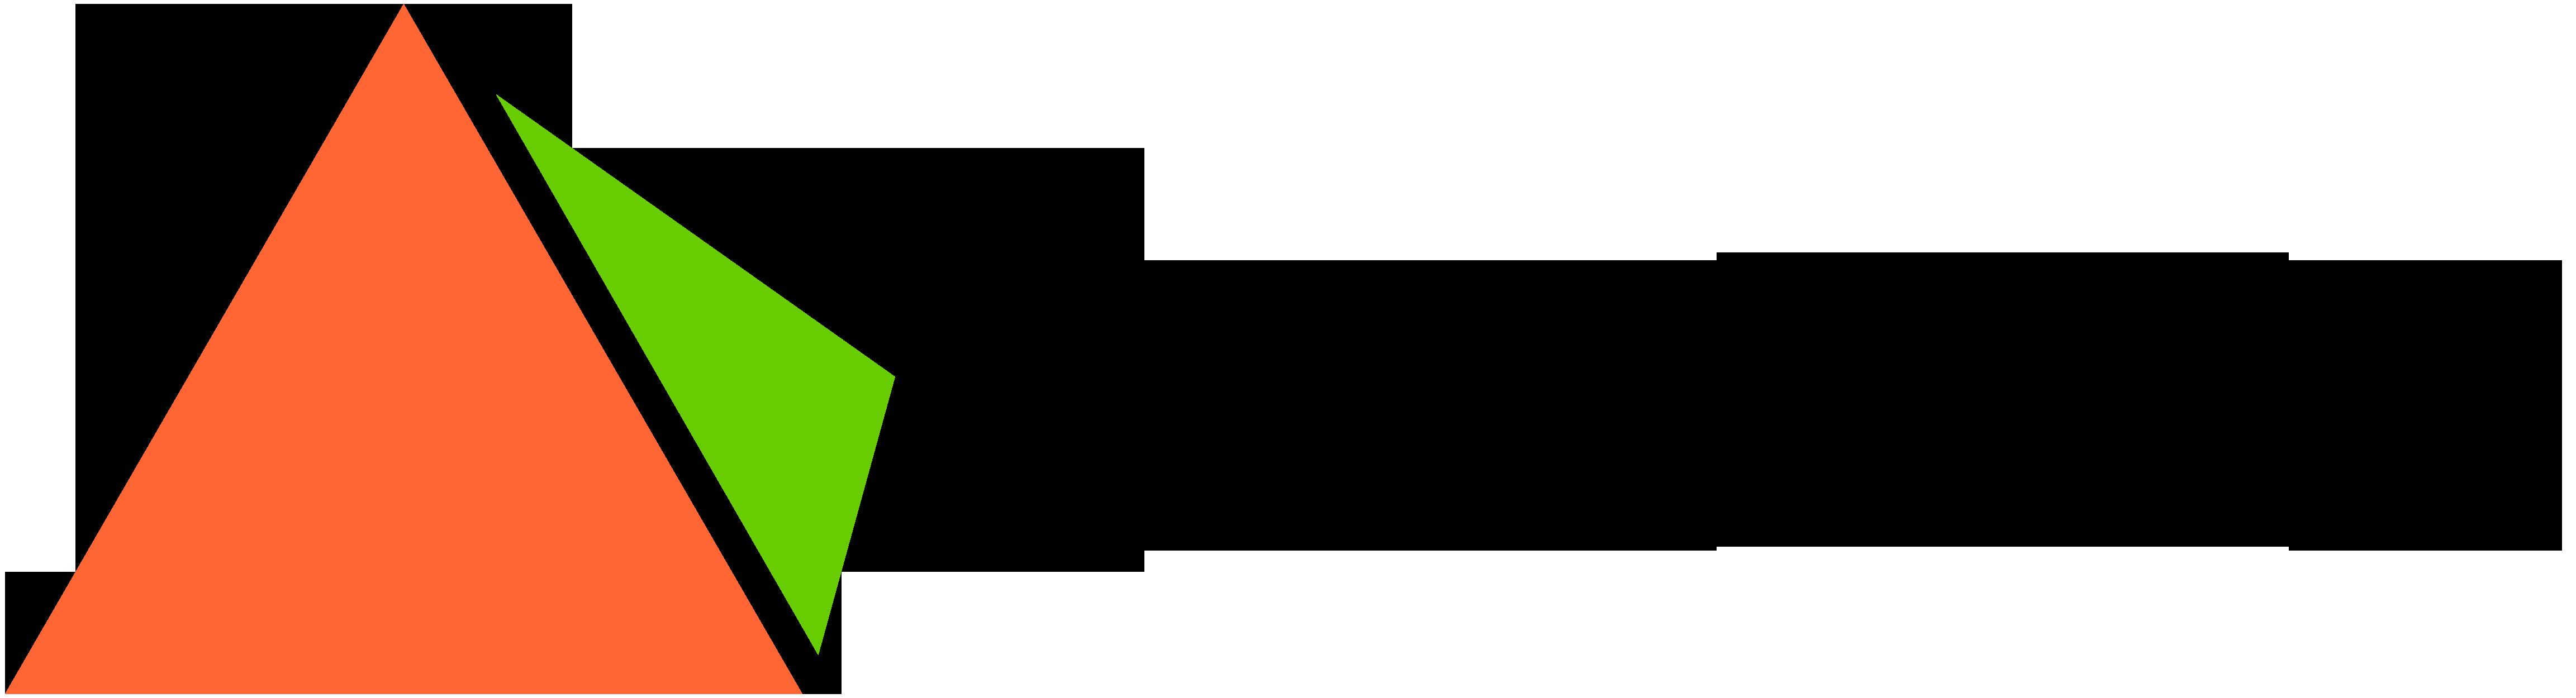 DeskMe Logo